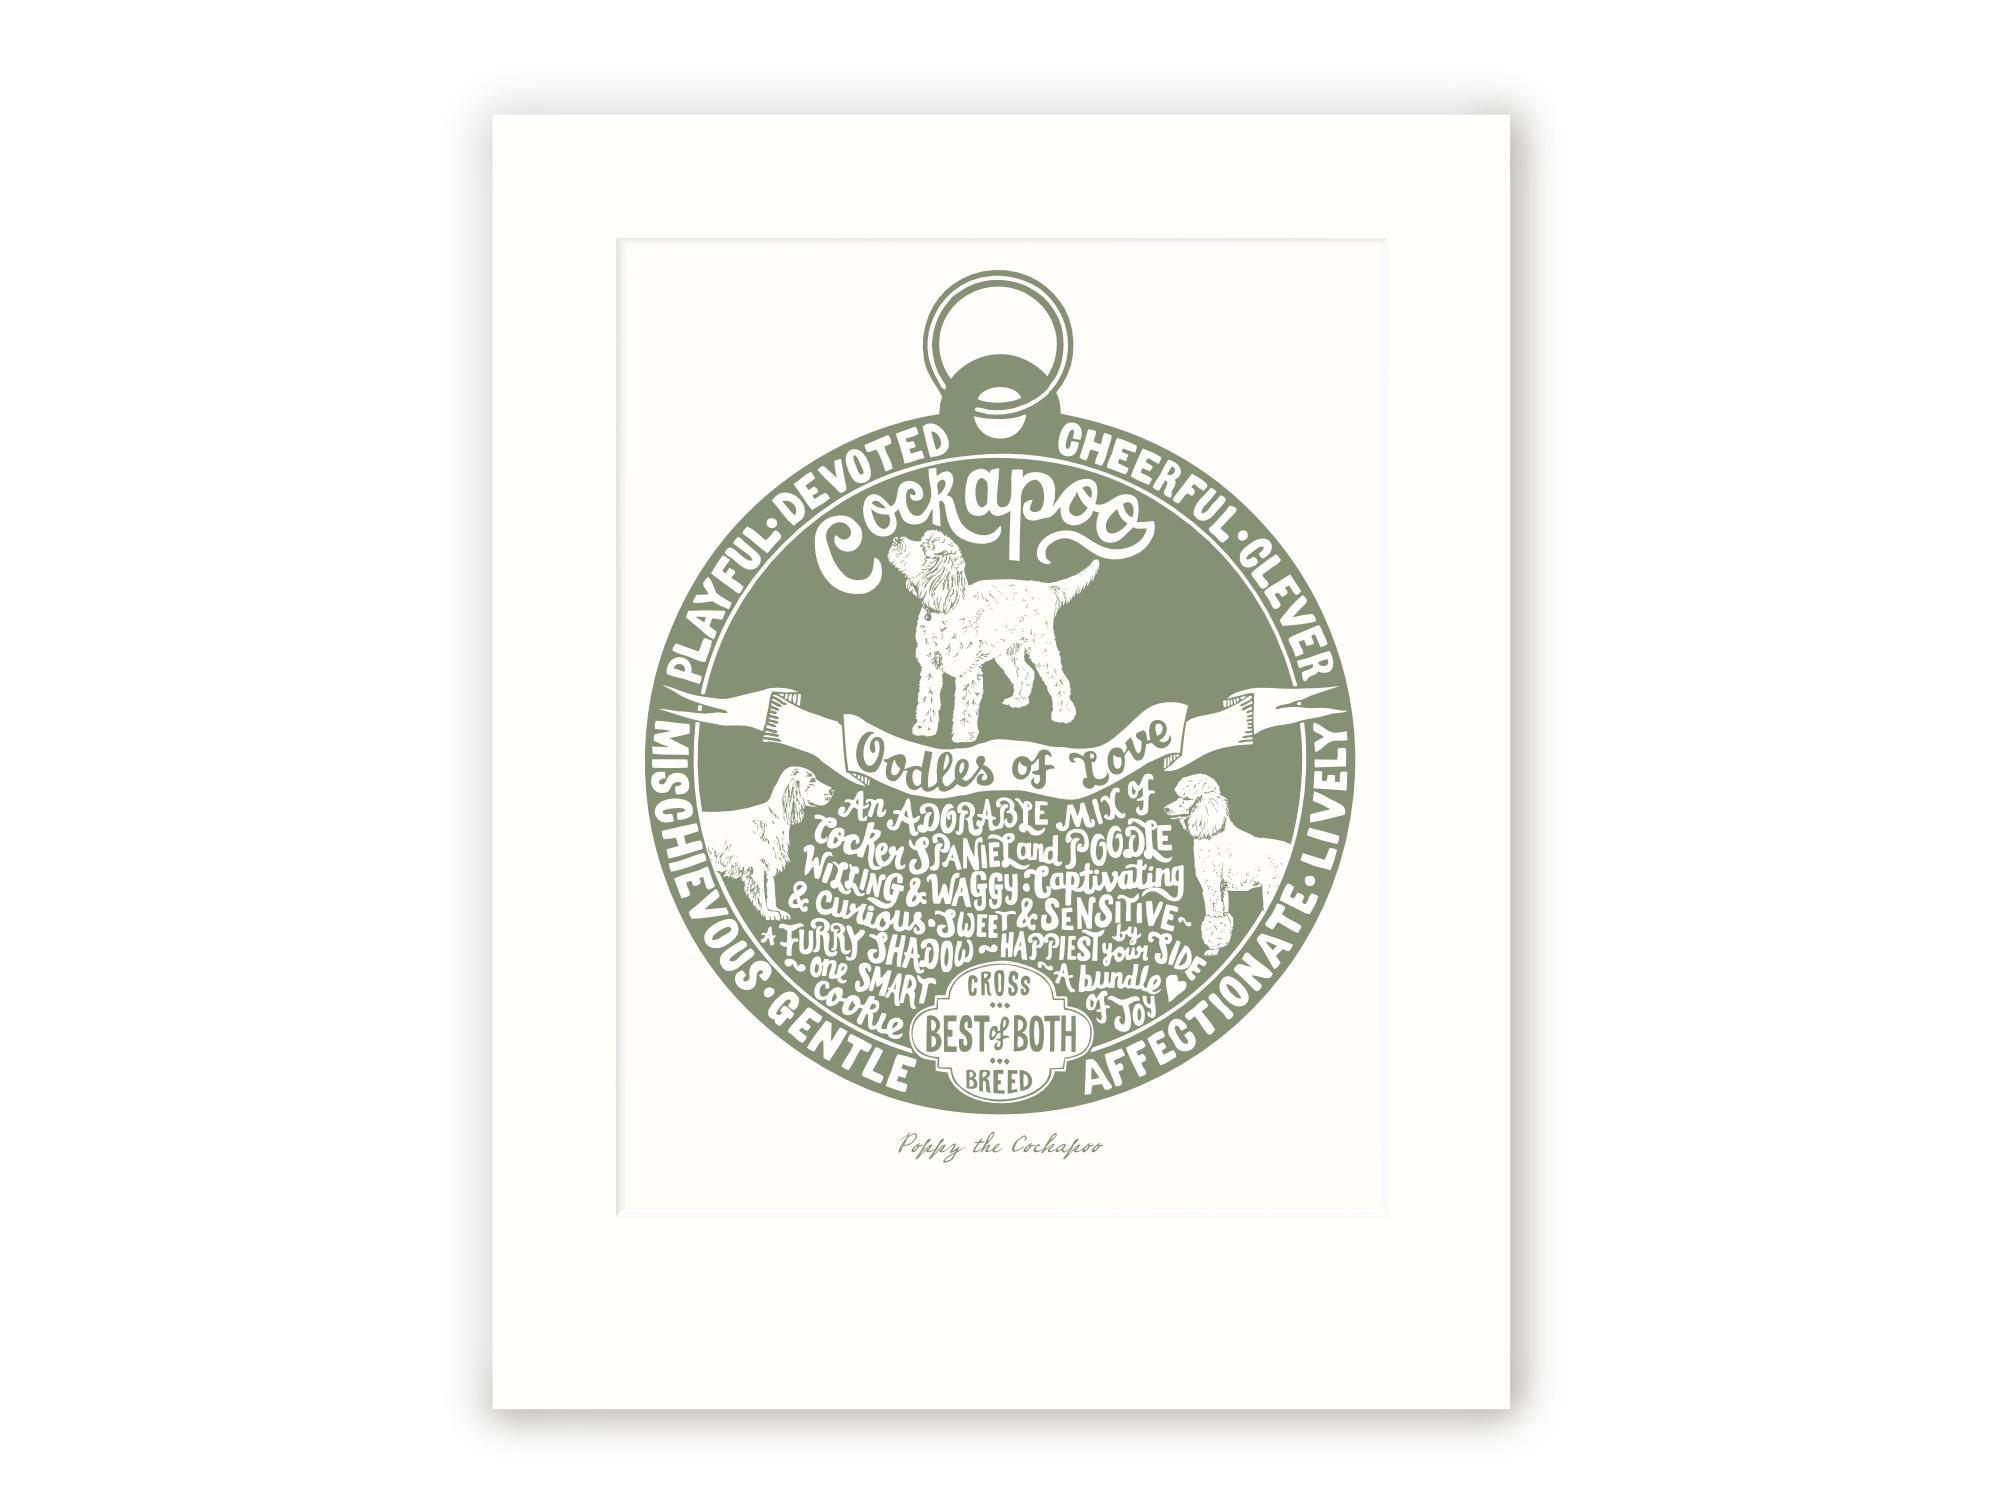 Cockapoo Art Print | The Enlightened Hound